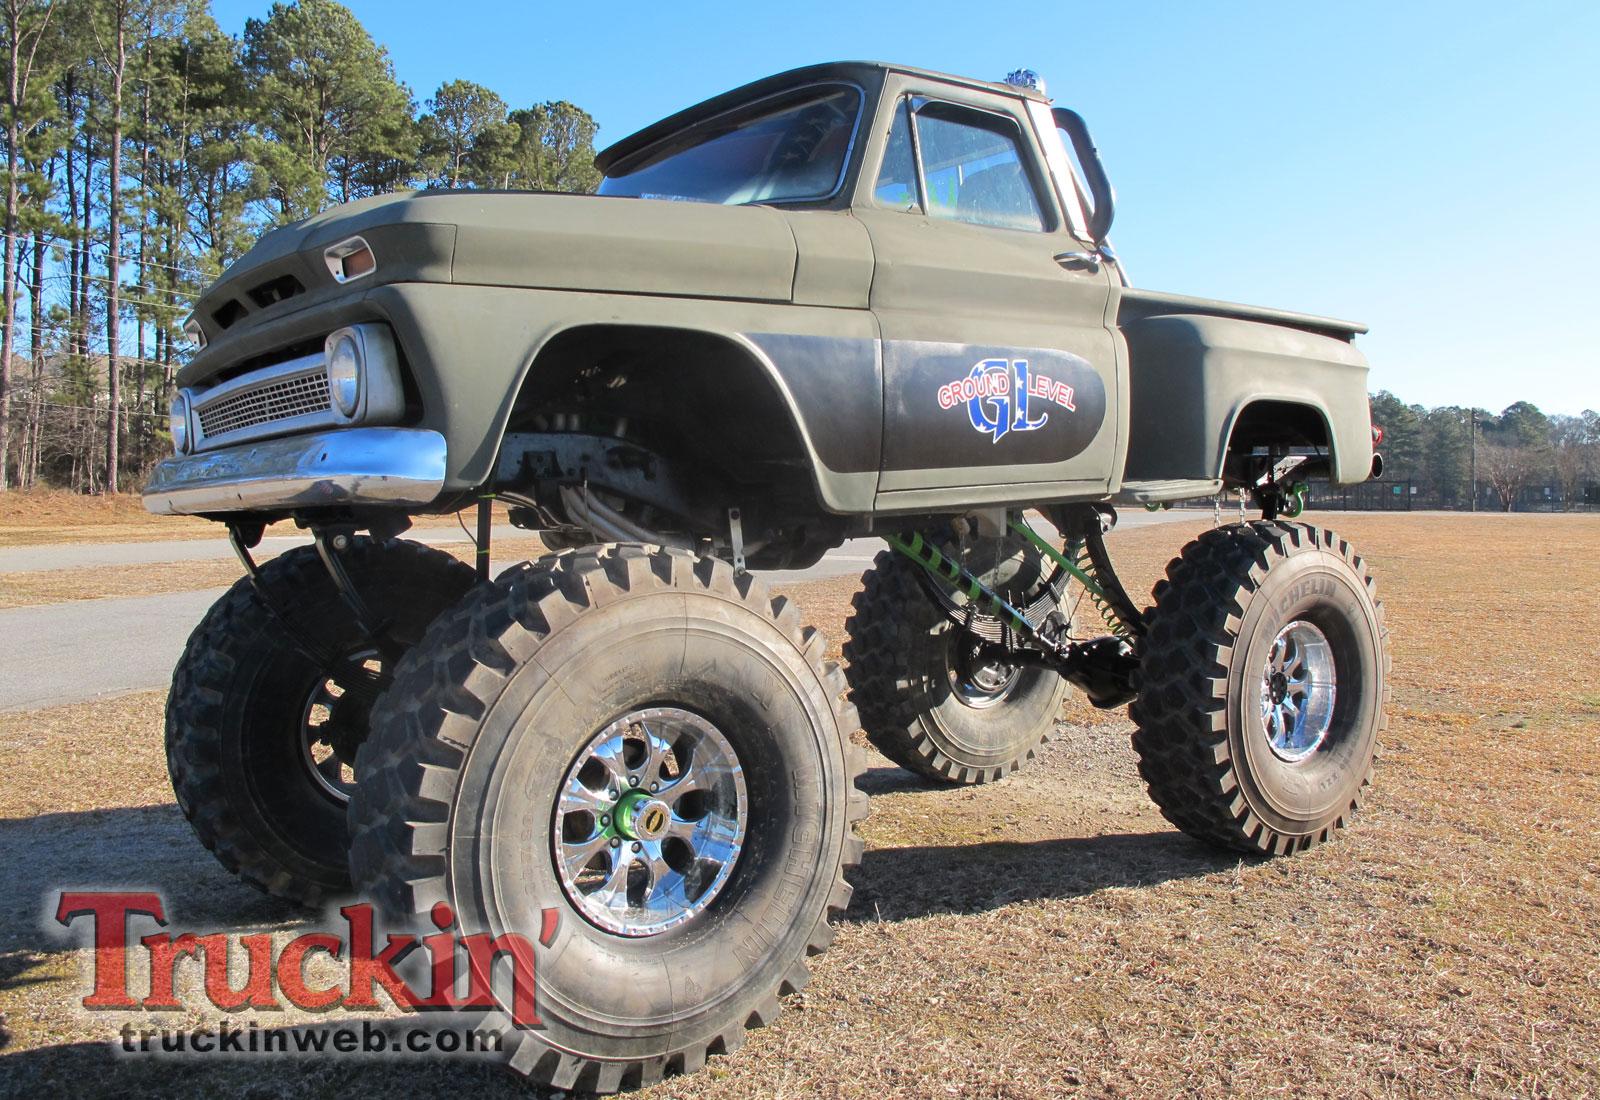 2010 Blooddrag Custom Truck Show - Web Exclusive Photo